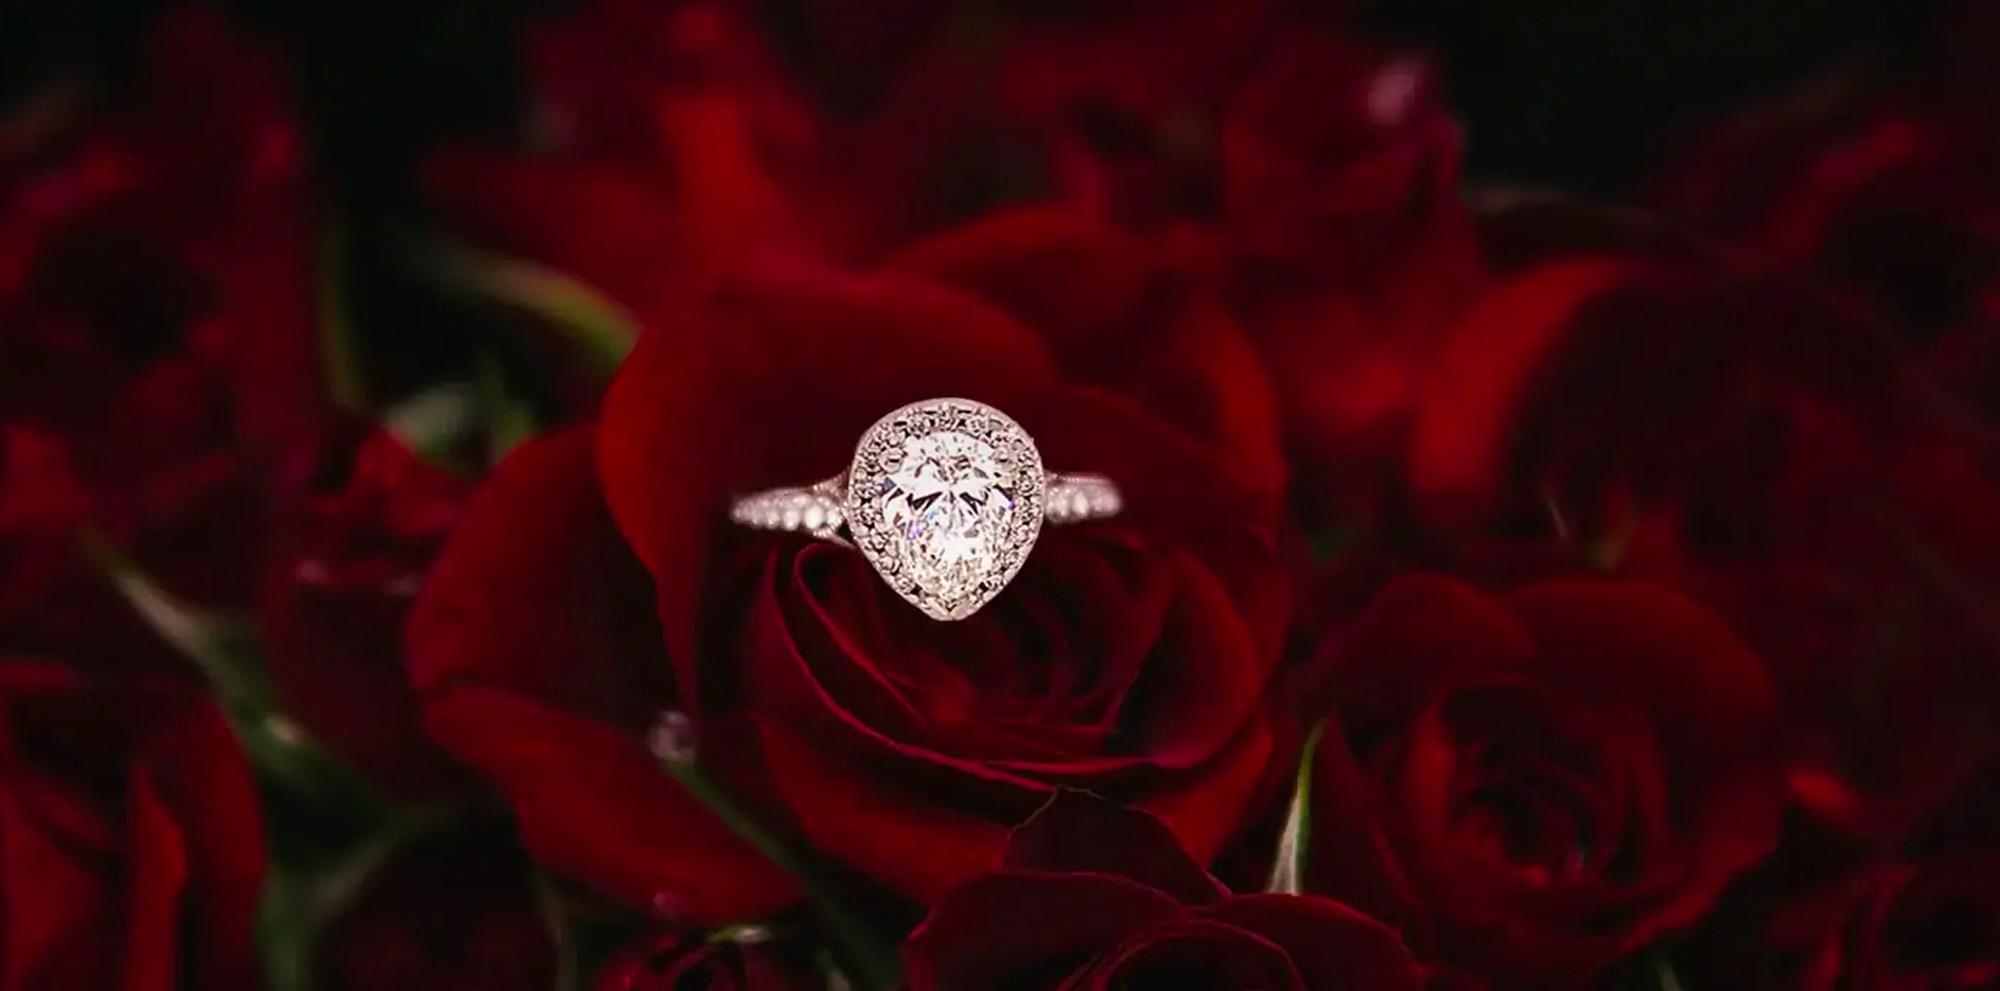 Enduring Love – Valentine's Day Gift Ideas